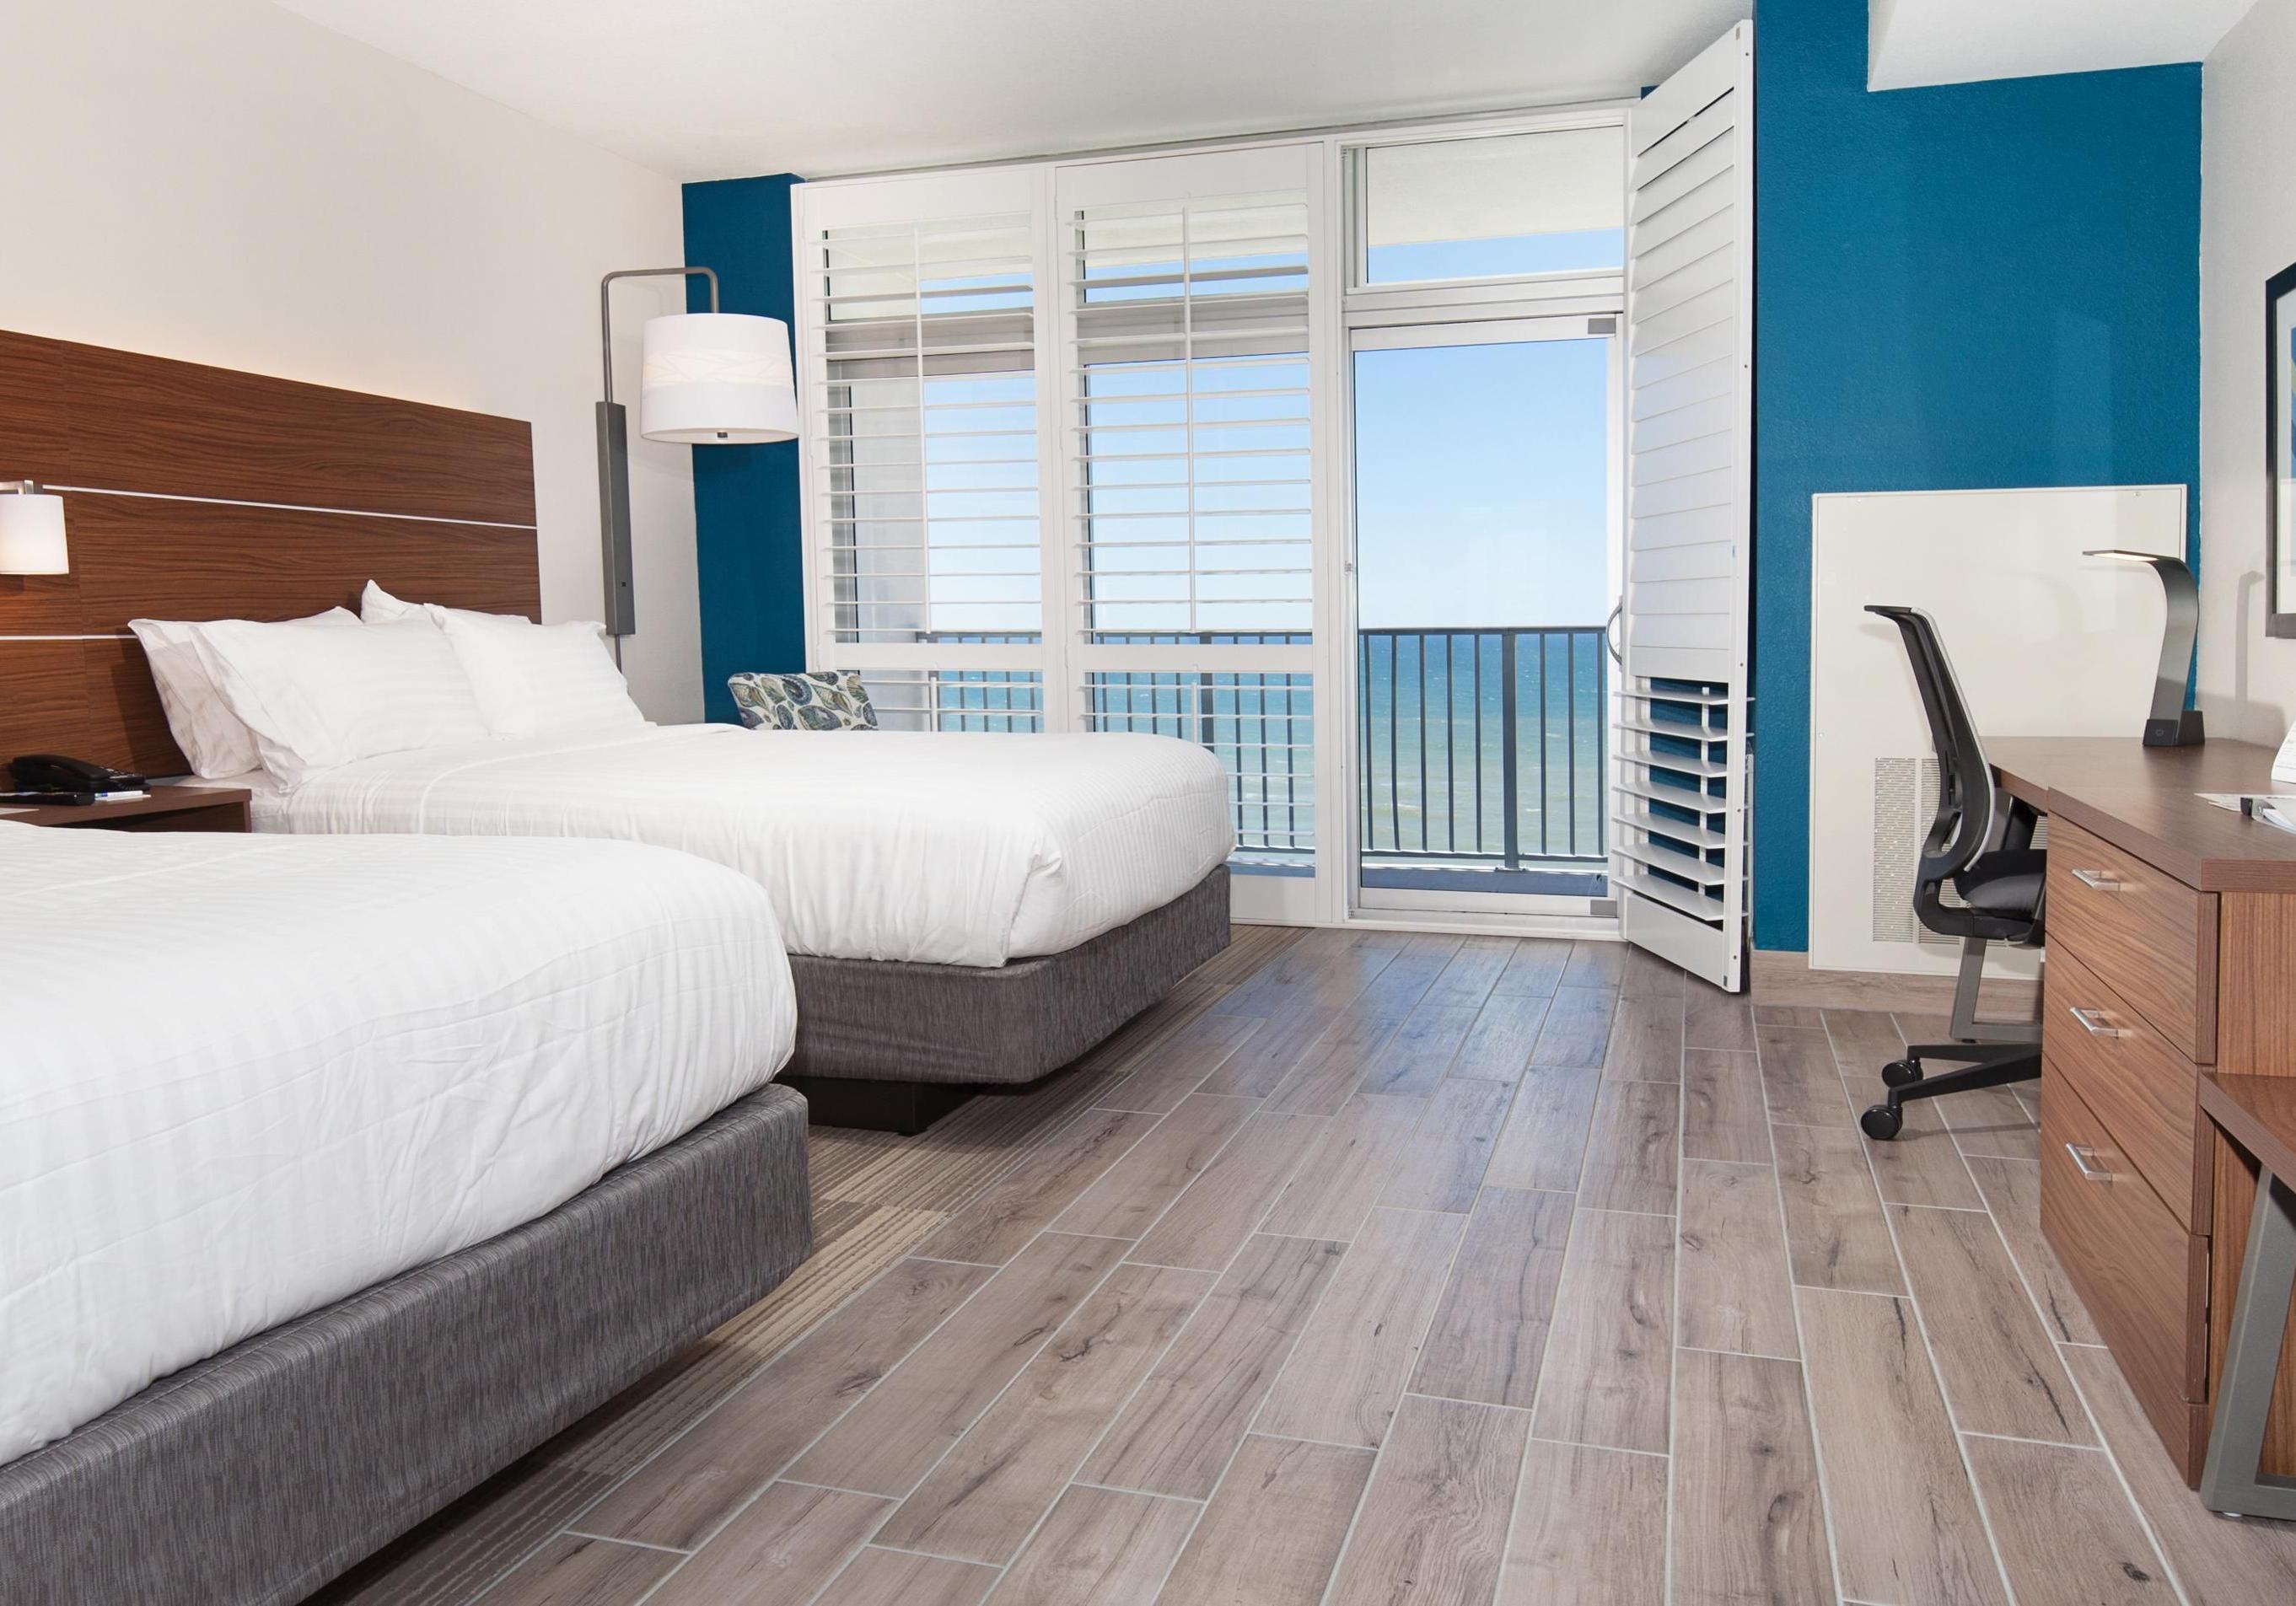 Holiday Inn Express & Suites Panama City Beach